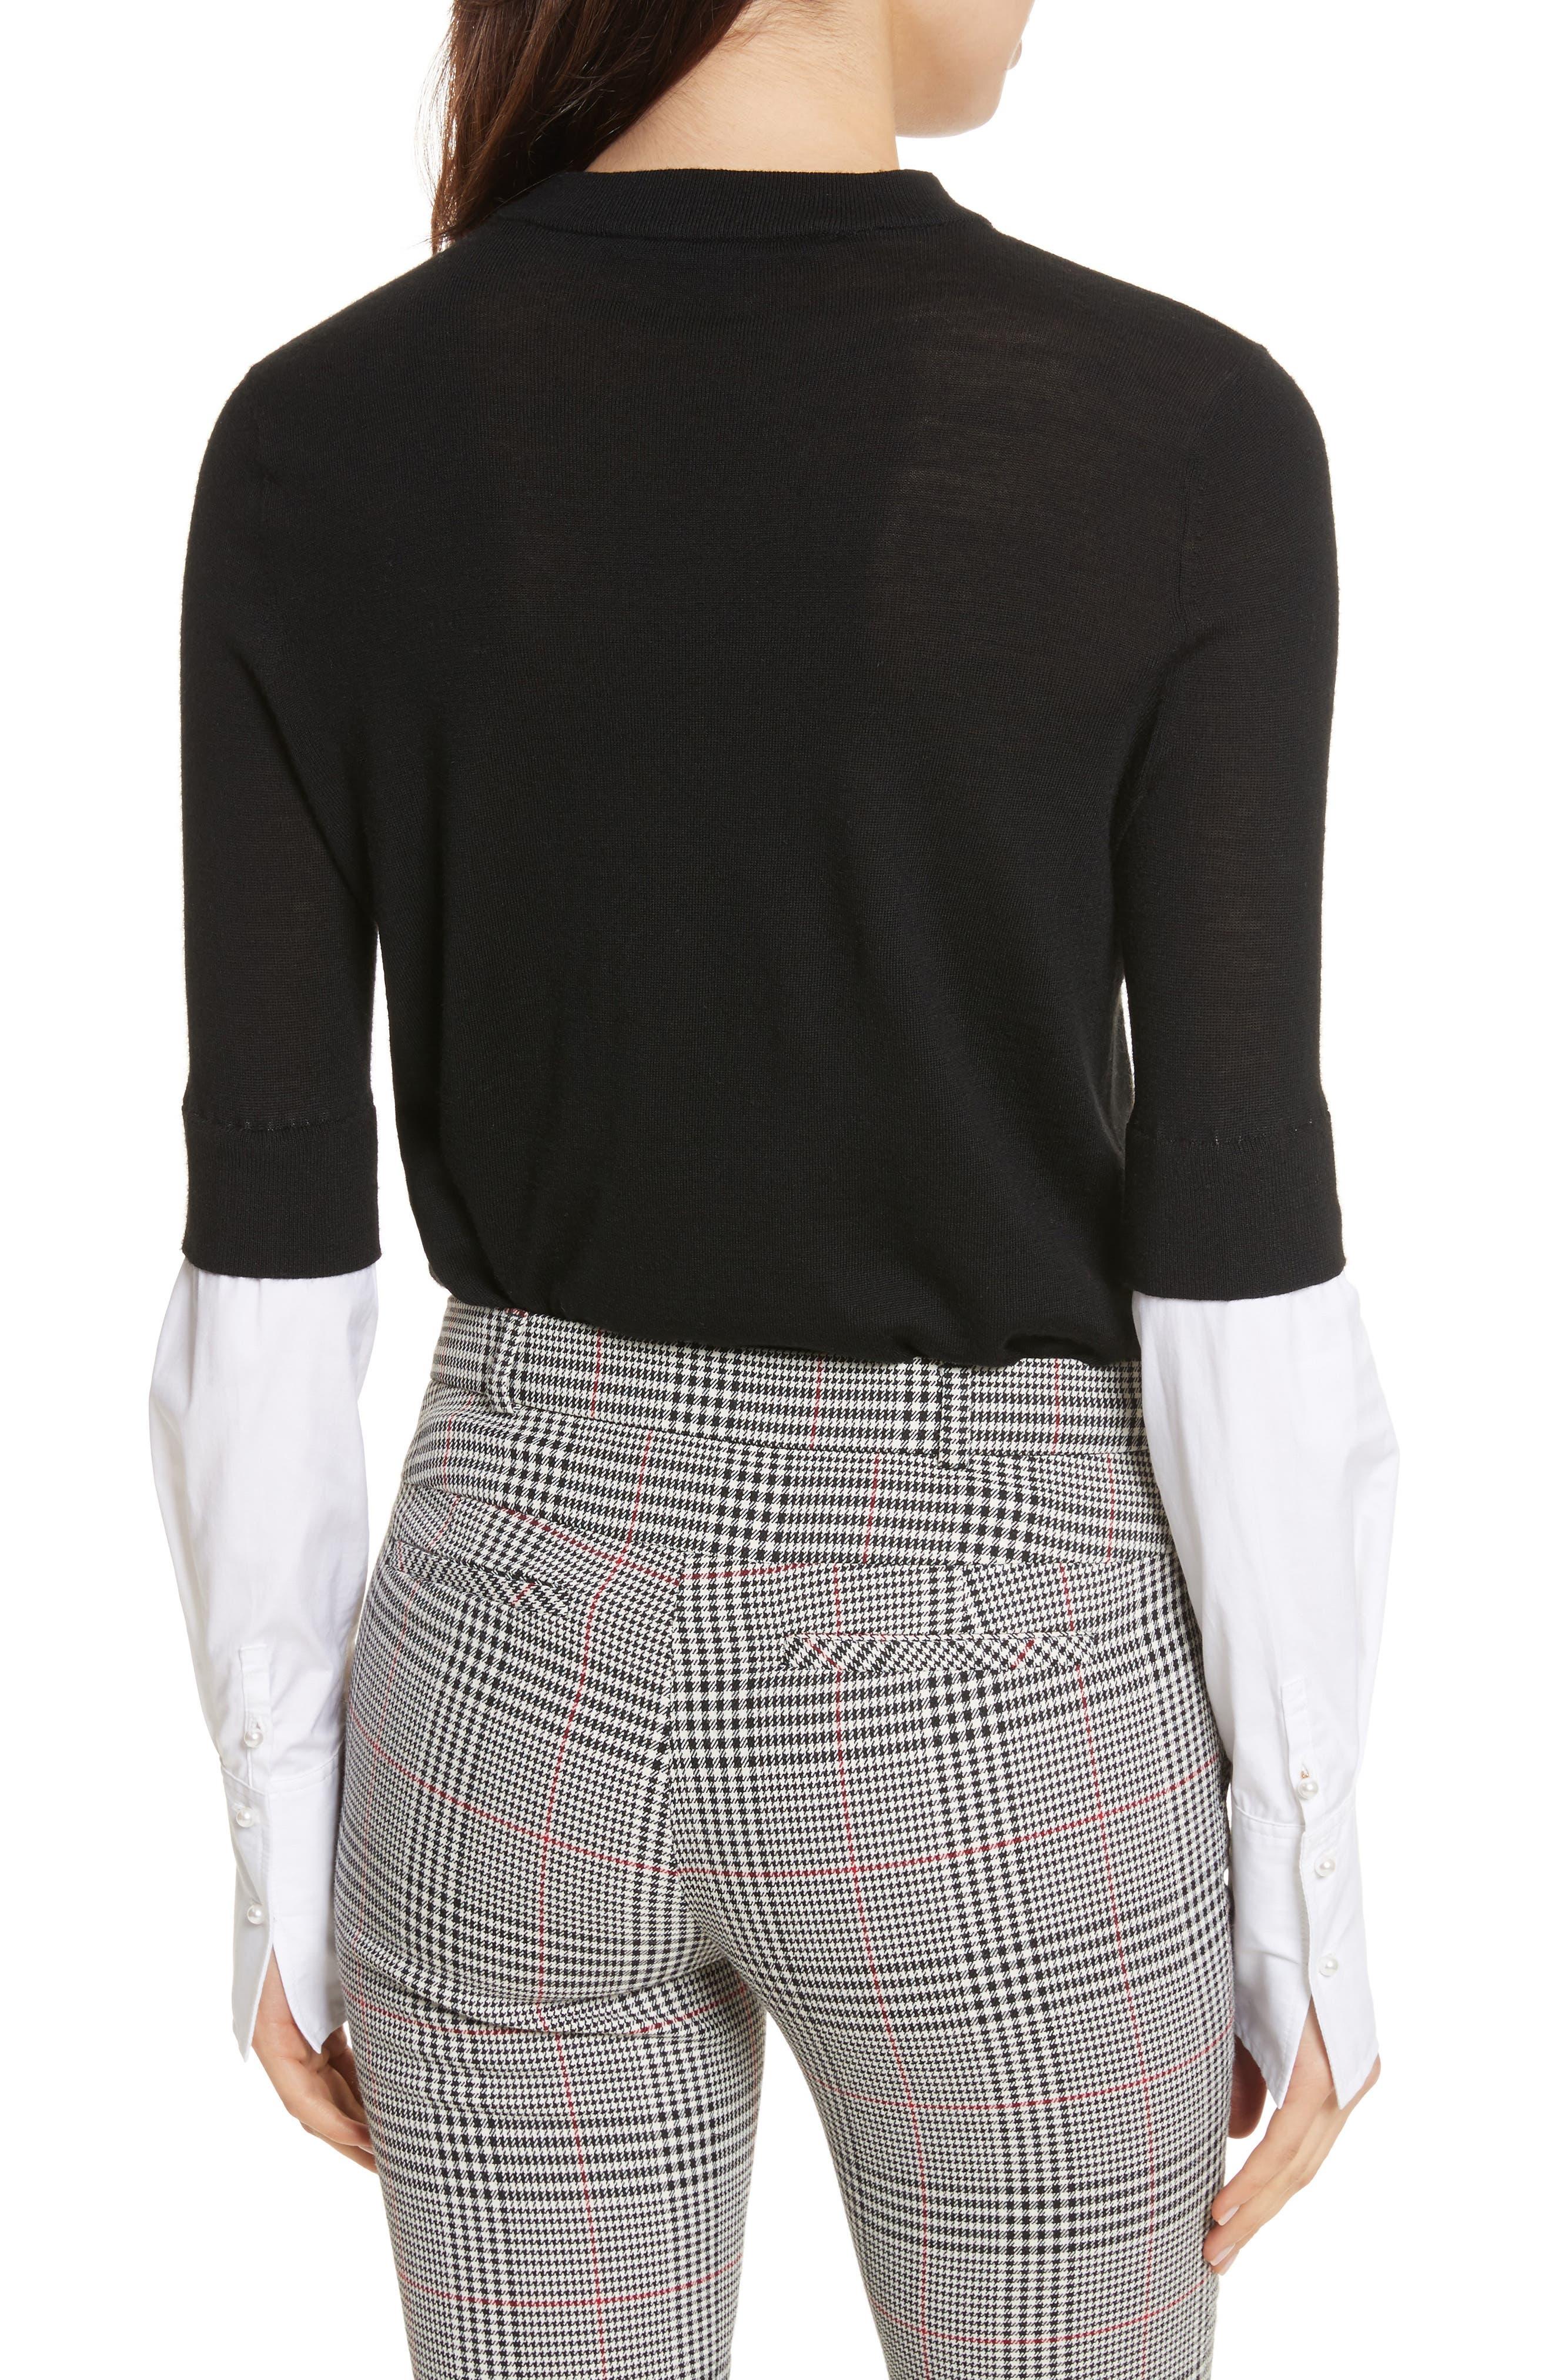 Roscoe Mixed Media Sweater,                             Alternate thumbnail 2, color,                             Black